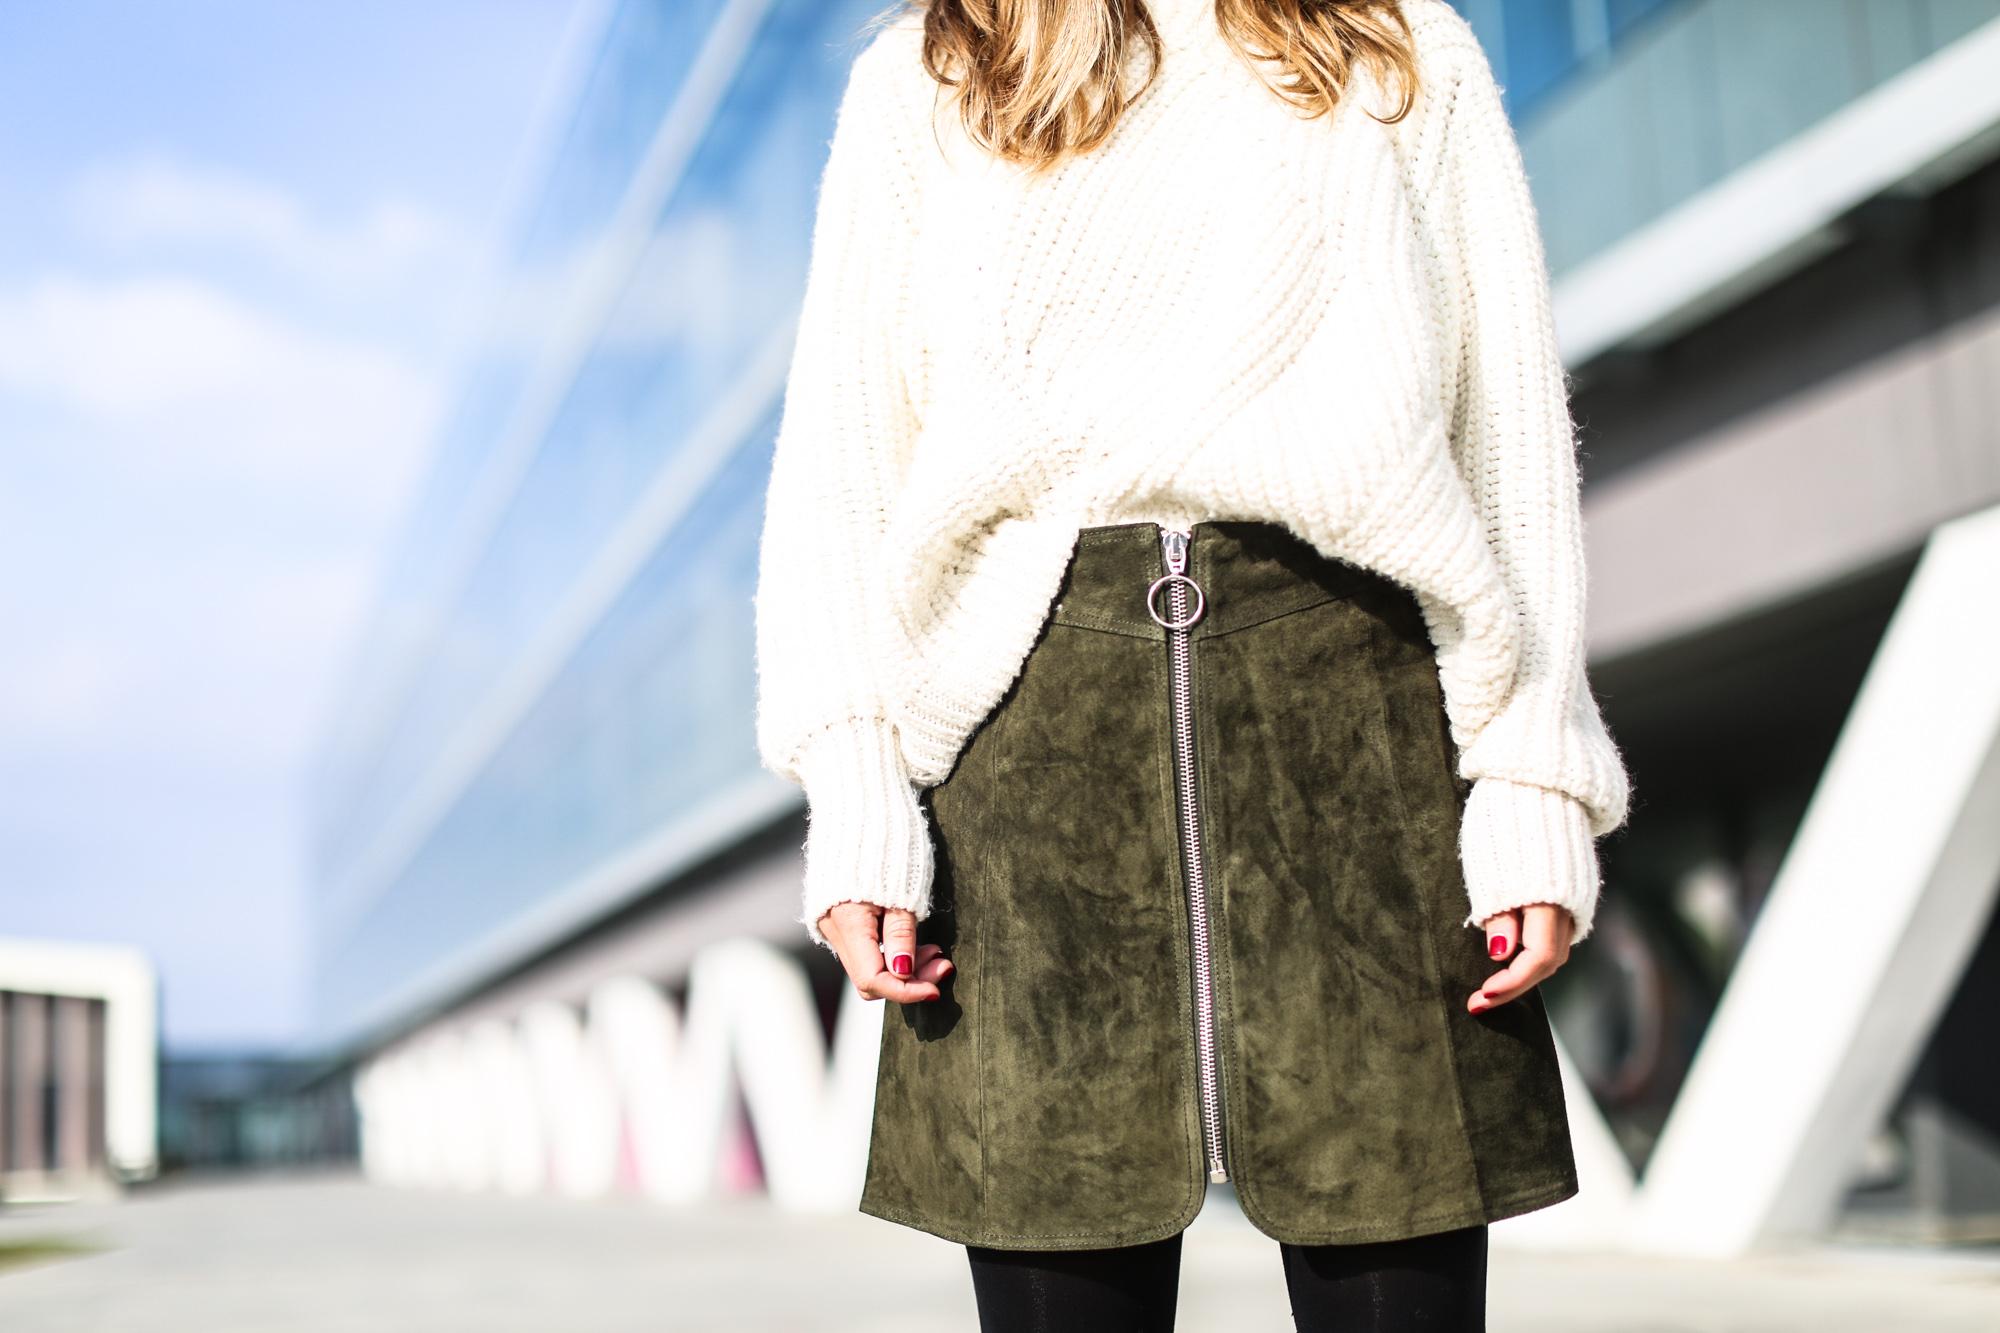 Clochet_streetstyle_fashionblogger_asosfauxfurcoat_minifaldaantezara_botinespieldorados-8